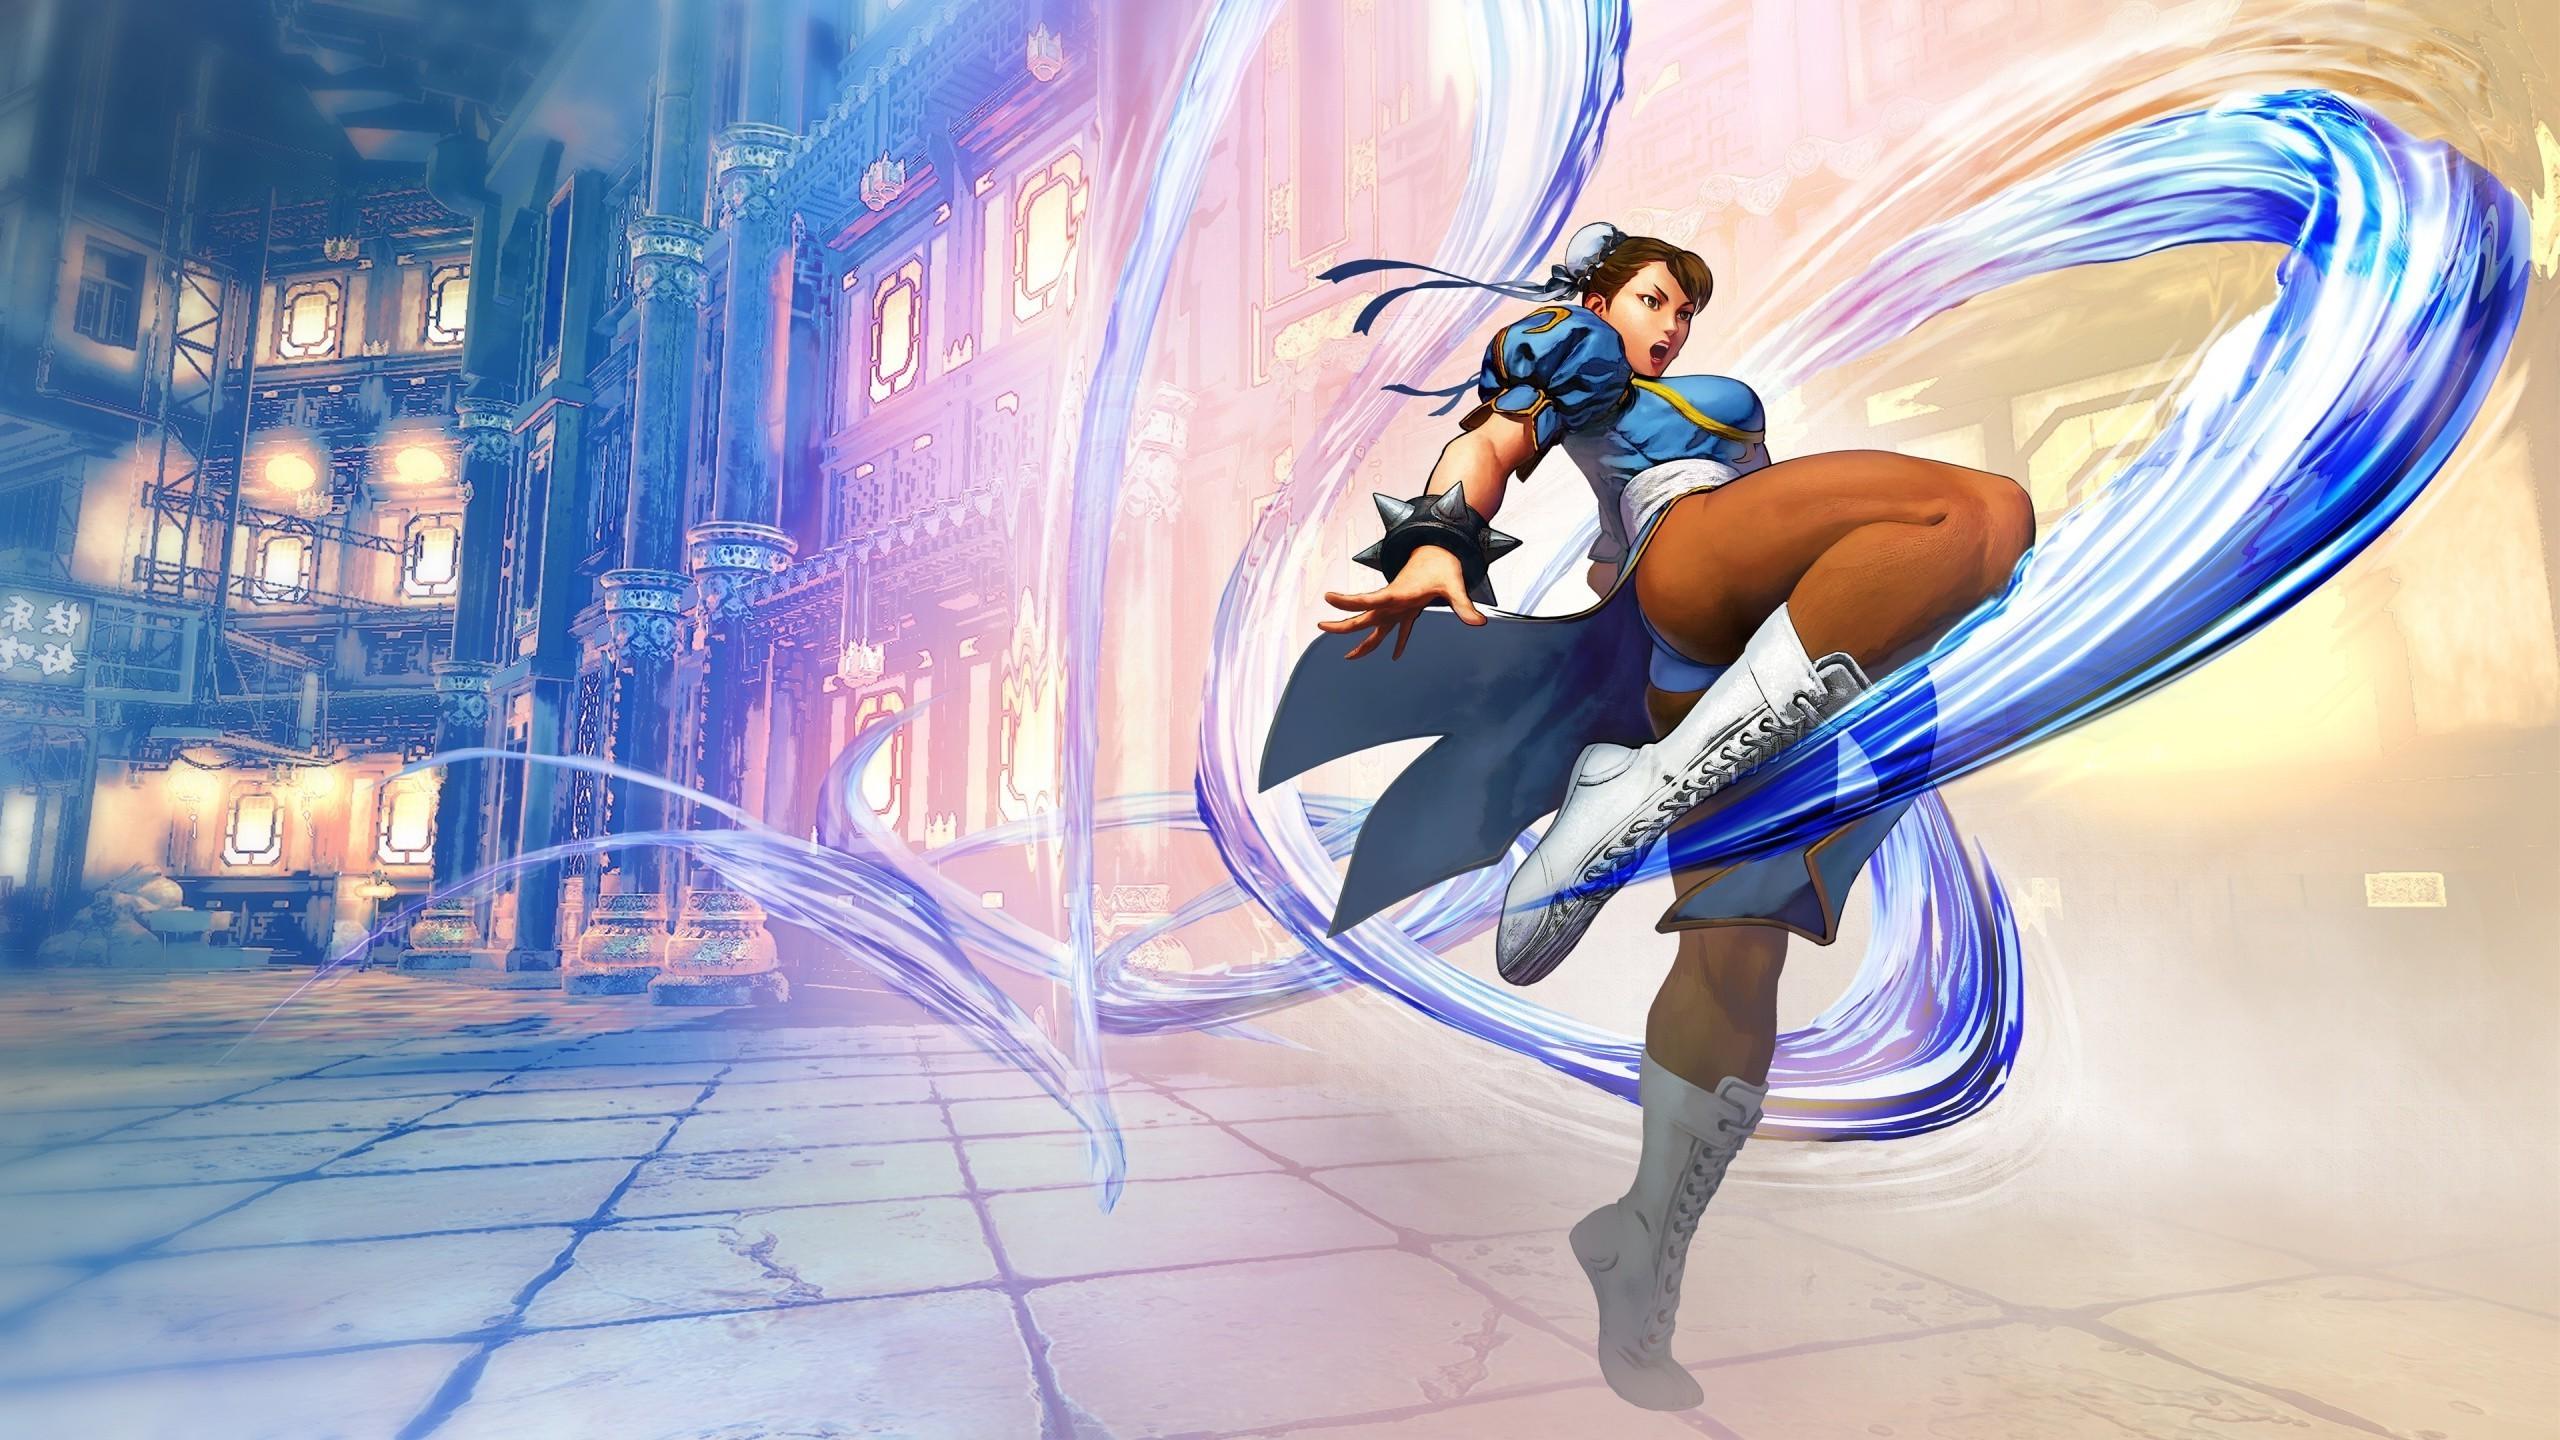 video Games, Video Game Girls, Chun Li, Street Fighter V, Street Fighter,  Artwork Wallpapers HD / Desktop and Mobile Backgrounds